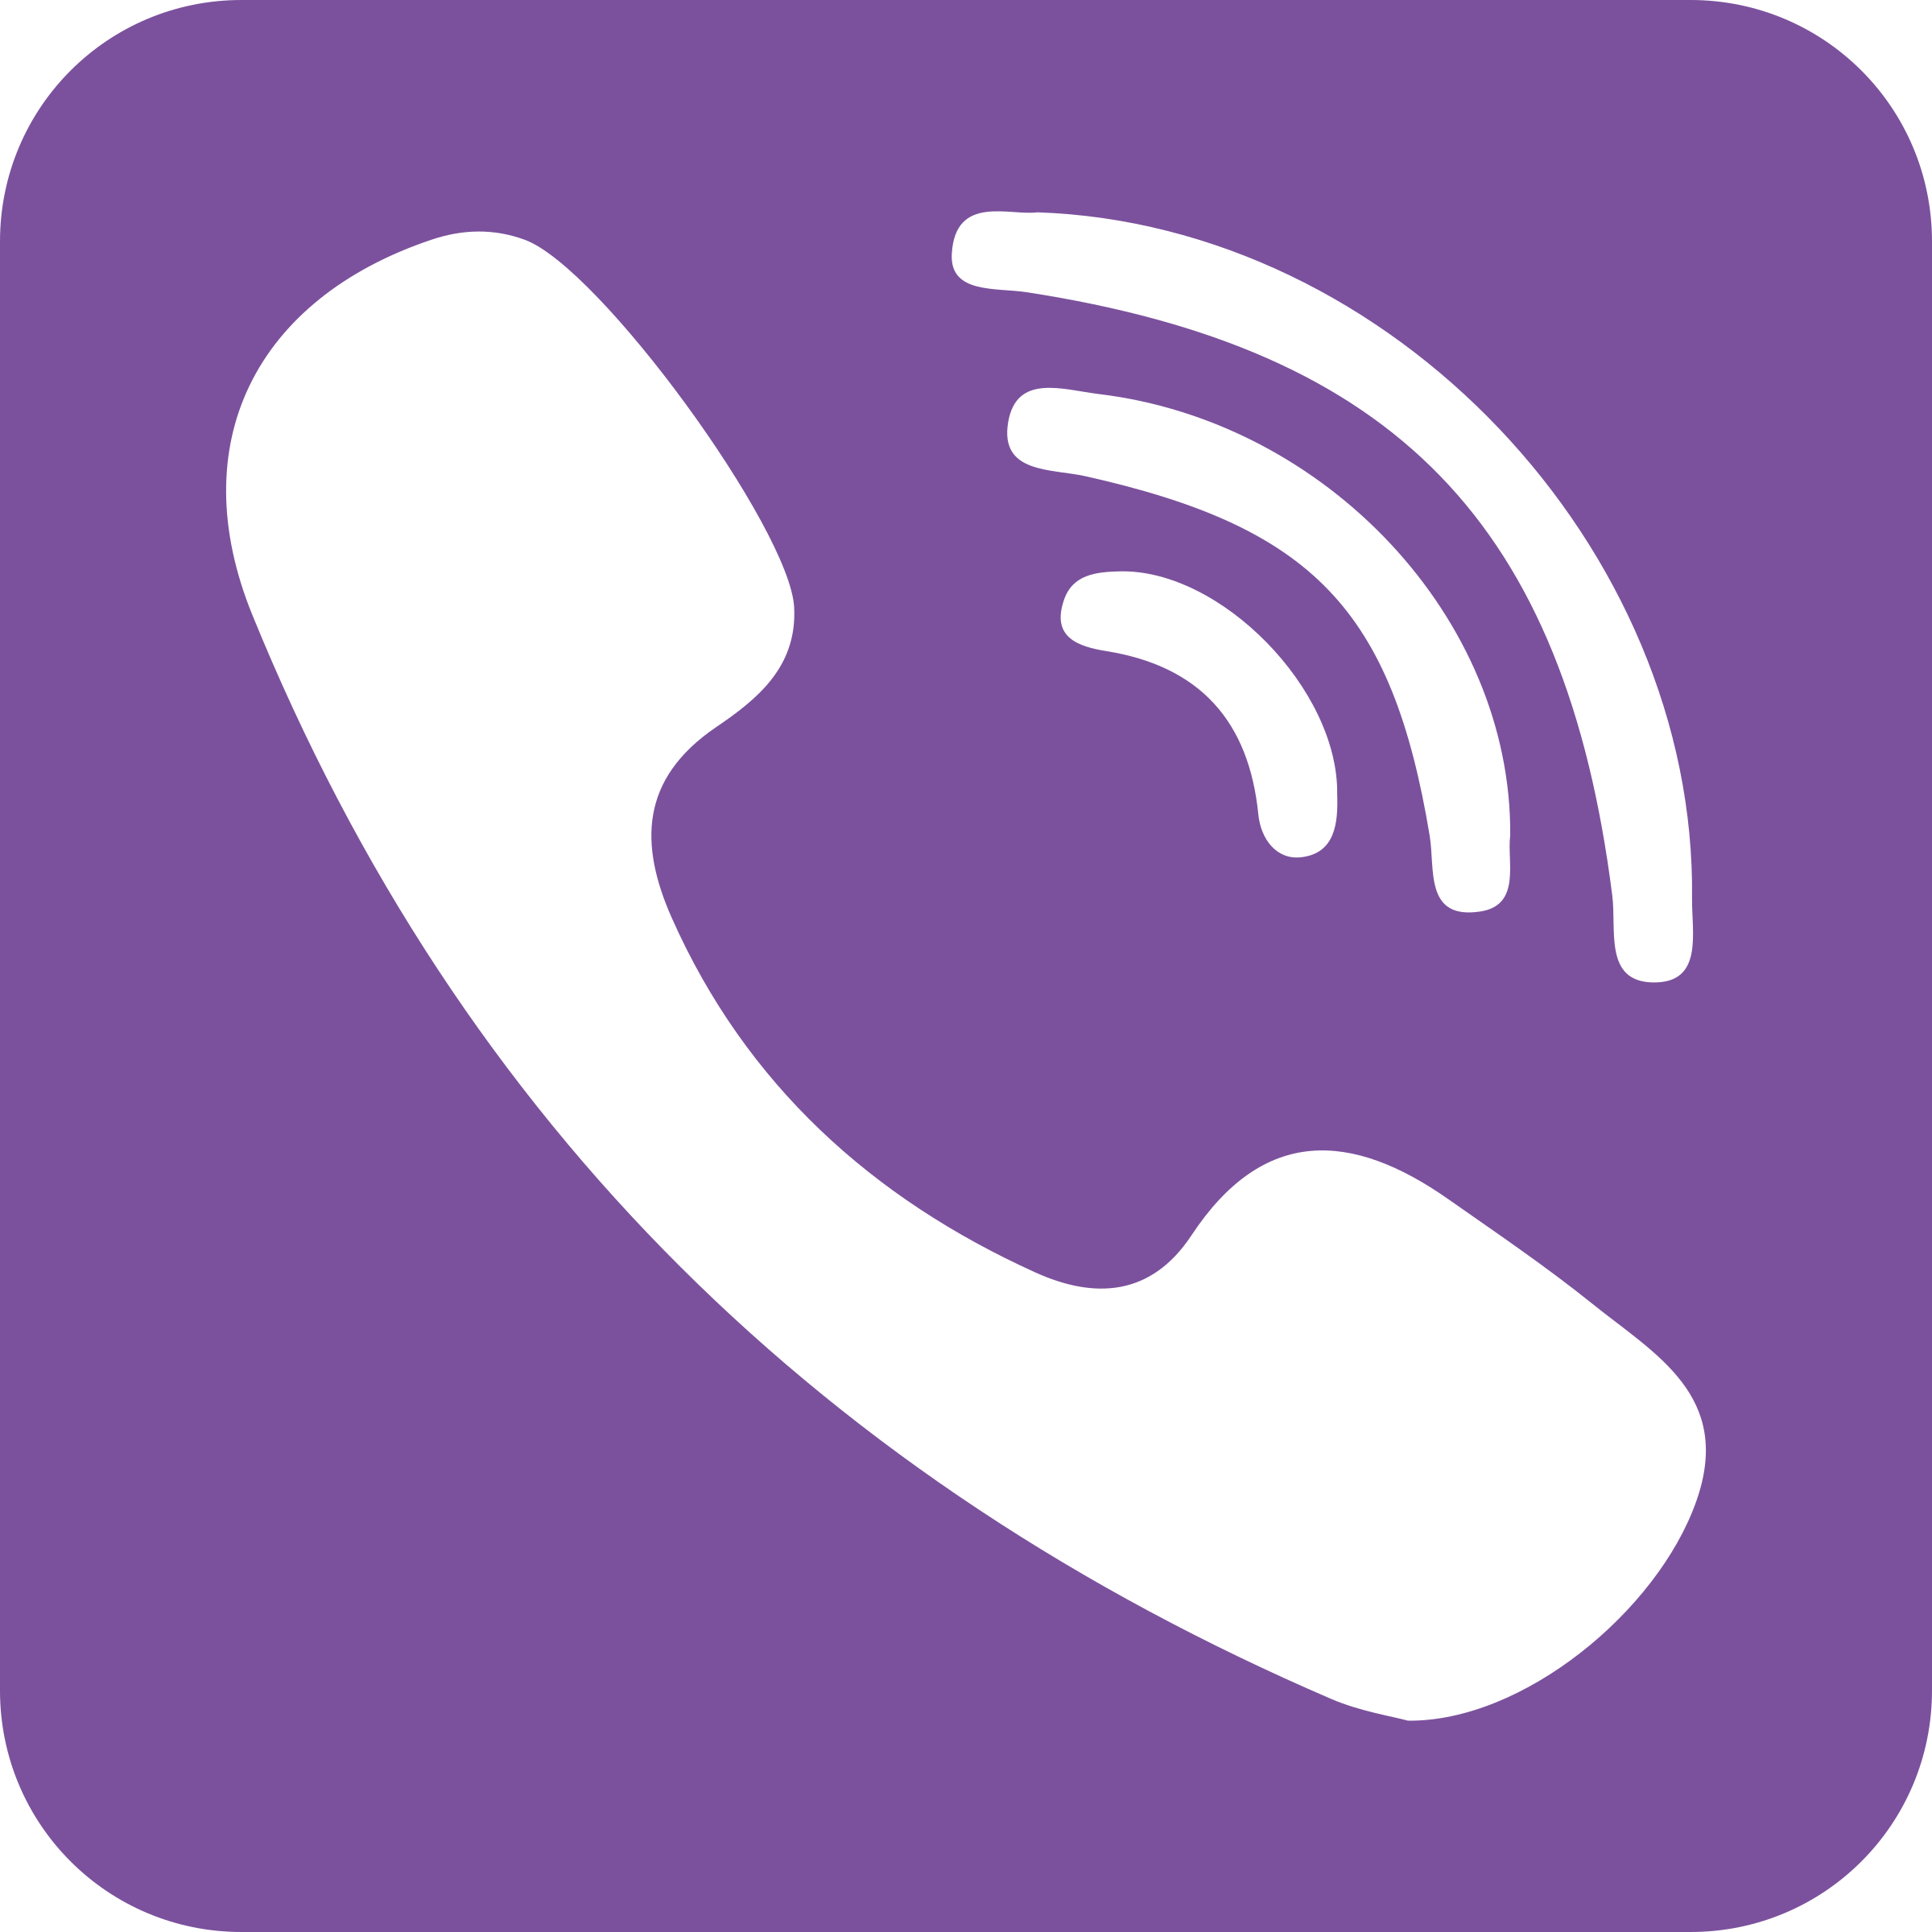 Картинки по запросу viber logo